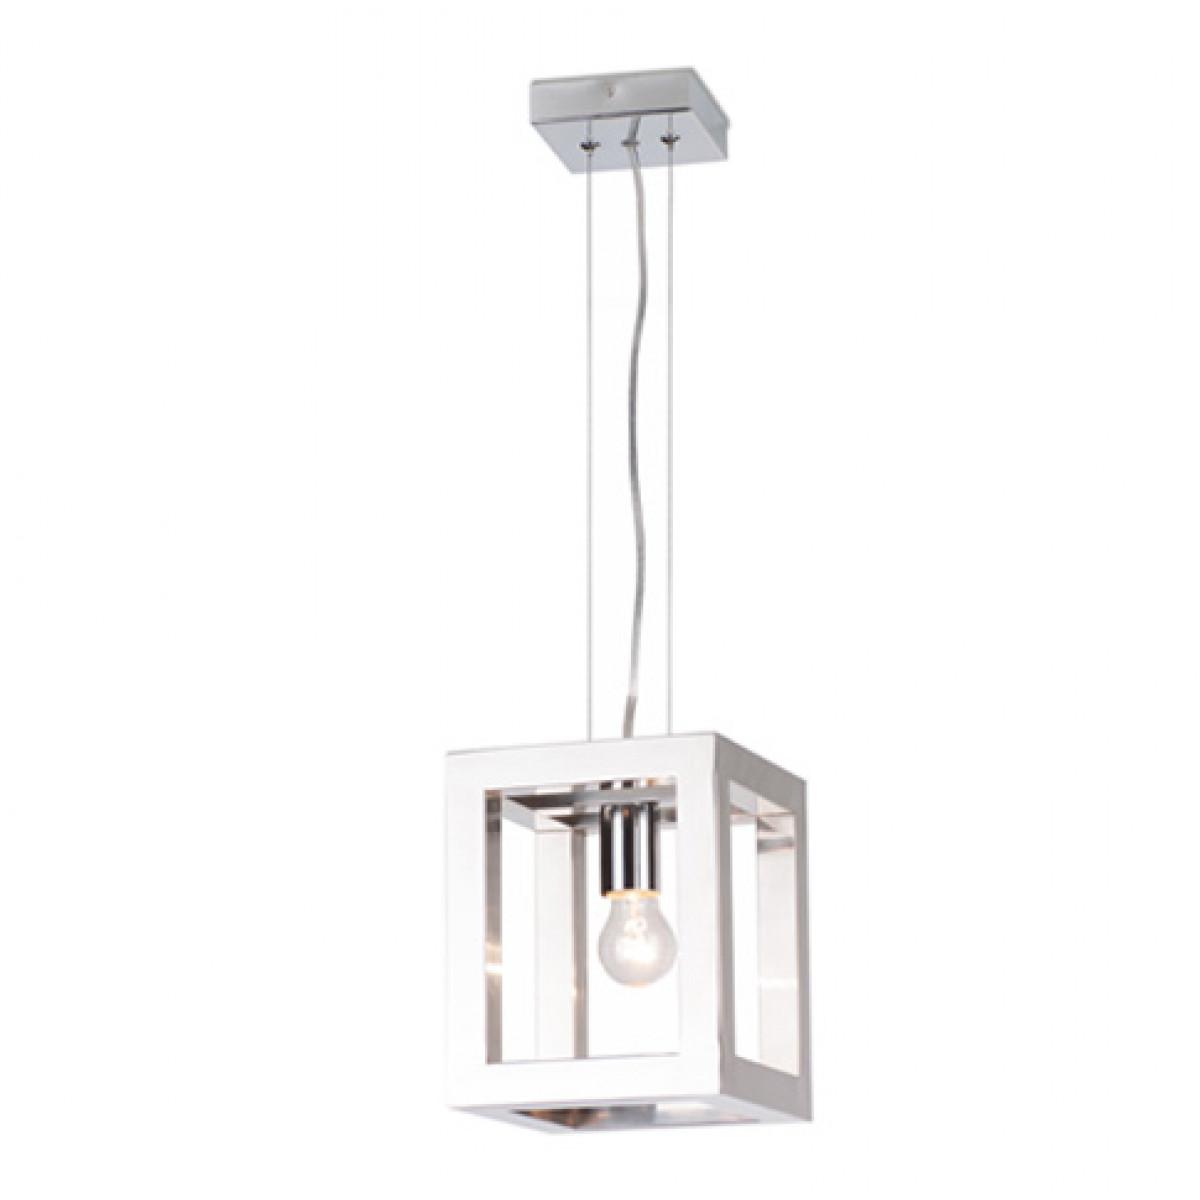 Plafondlamp Open Chroom (LV63371/CH) -  - Plafondlampen